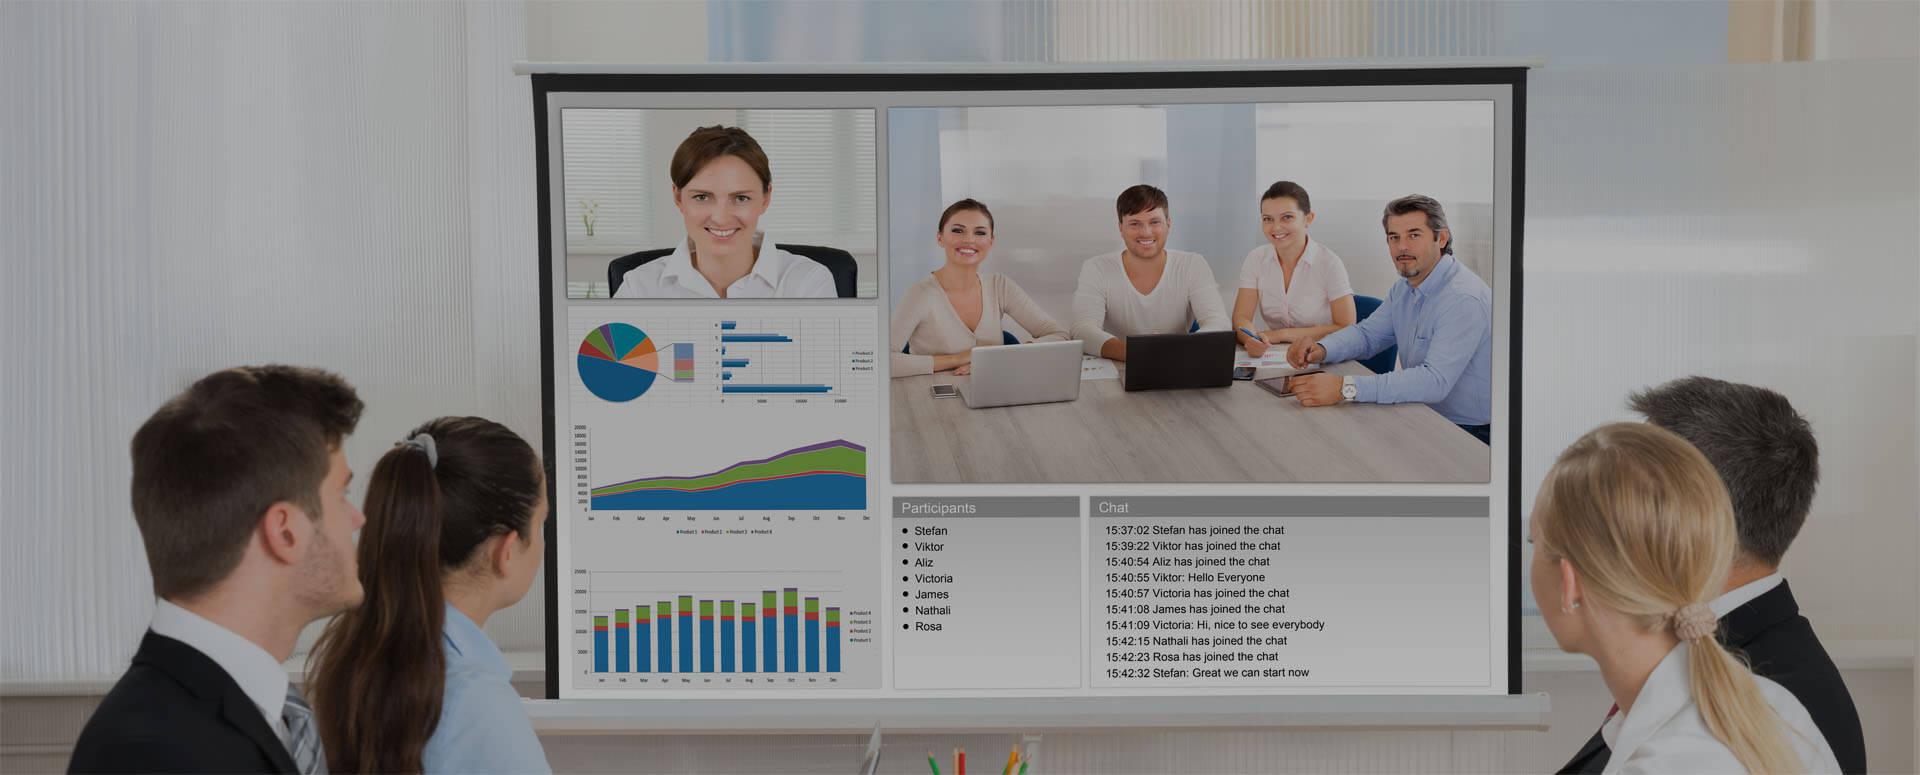 webinars-EHS-compliance-resources.jpg